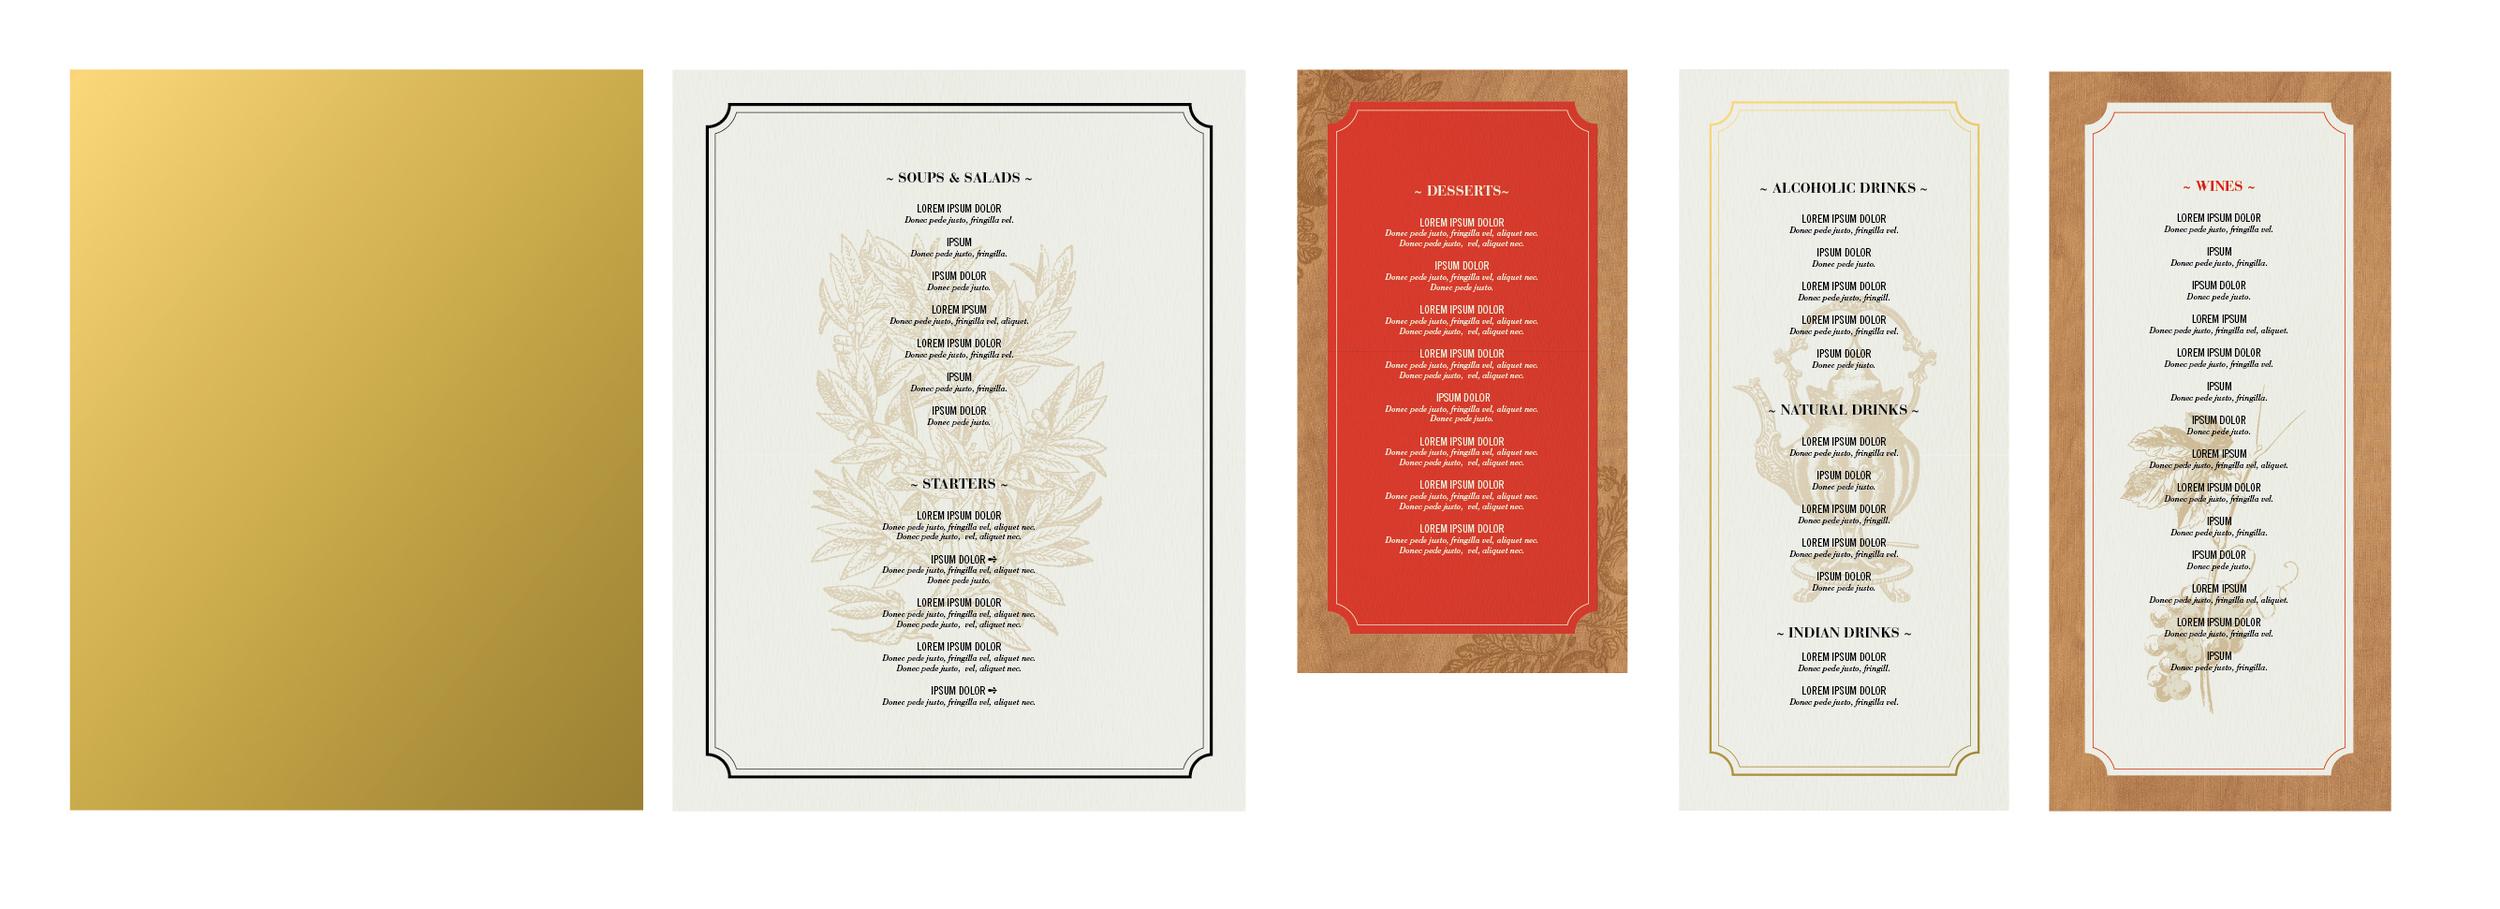 10 08 menu NAANS-01.jpeg